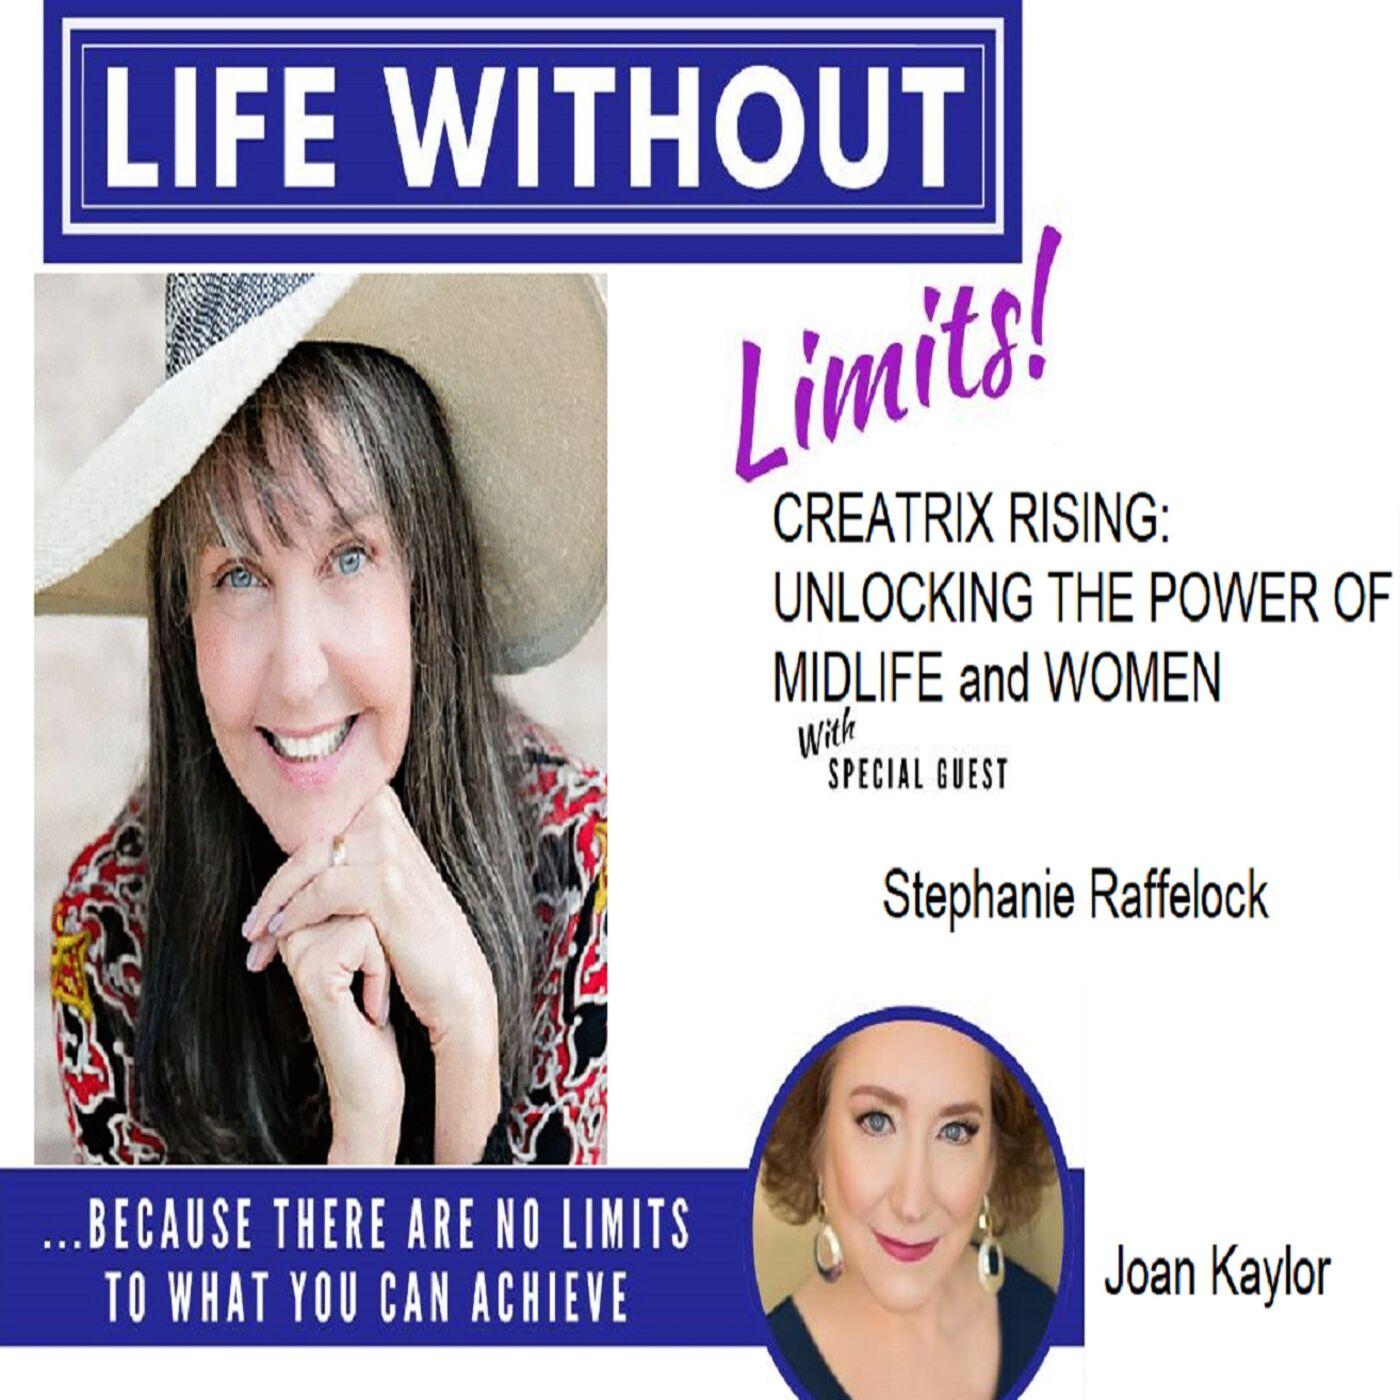 CREATRIX RISING: UNLOCKING THE POWER OF #MIDLIFE and #WOMEN